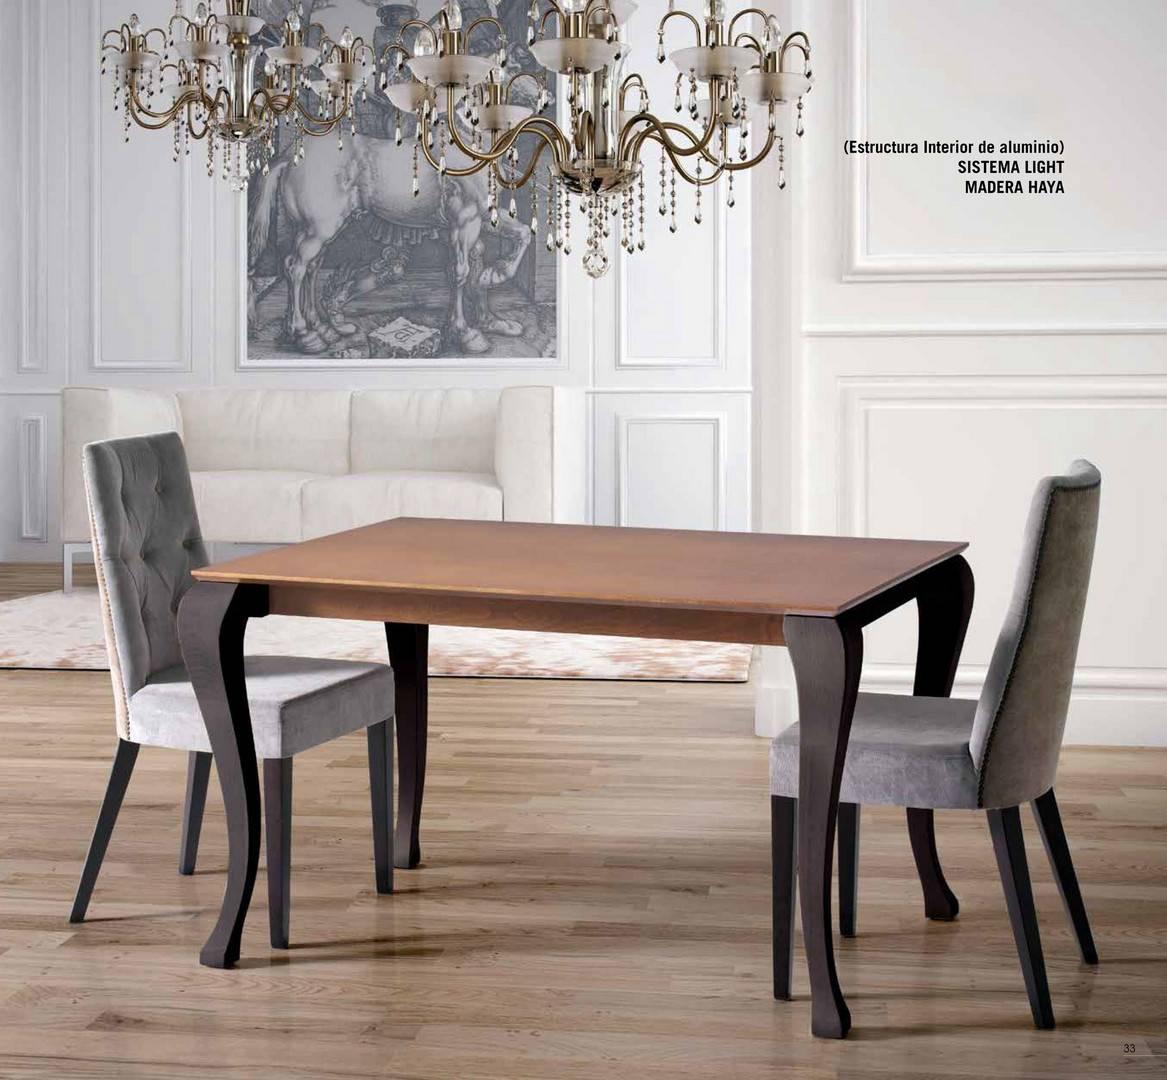 Decoraci n rafael caballero mesas de comedor - Decoracion mesa comedor ...